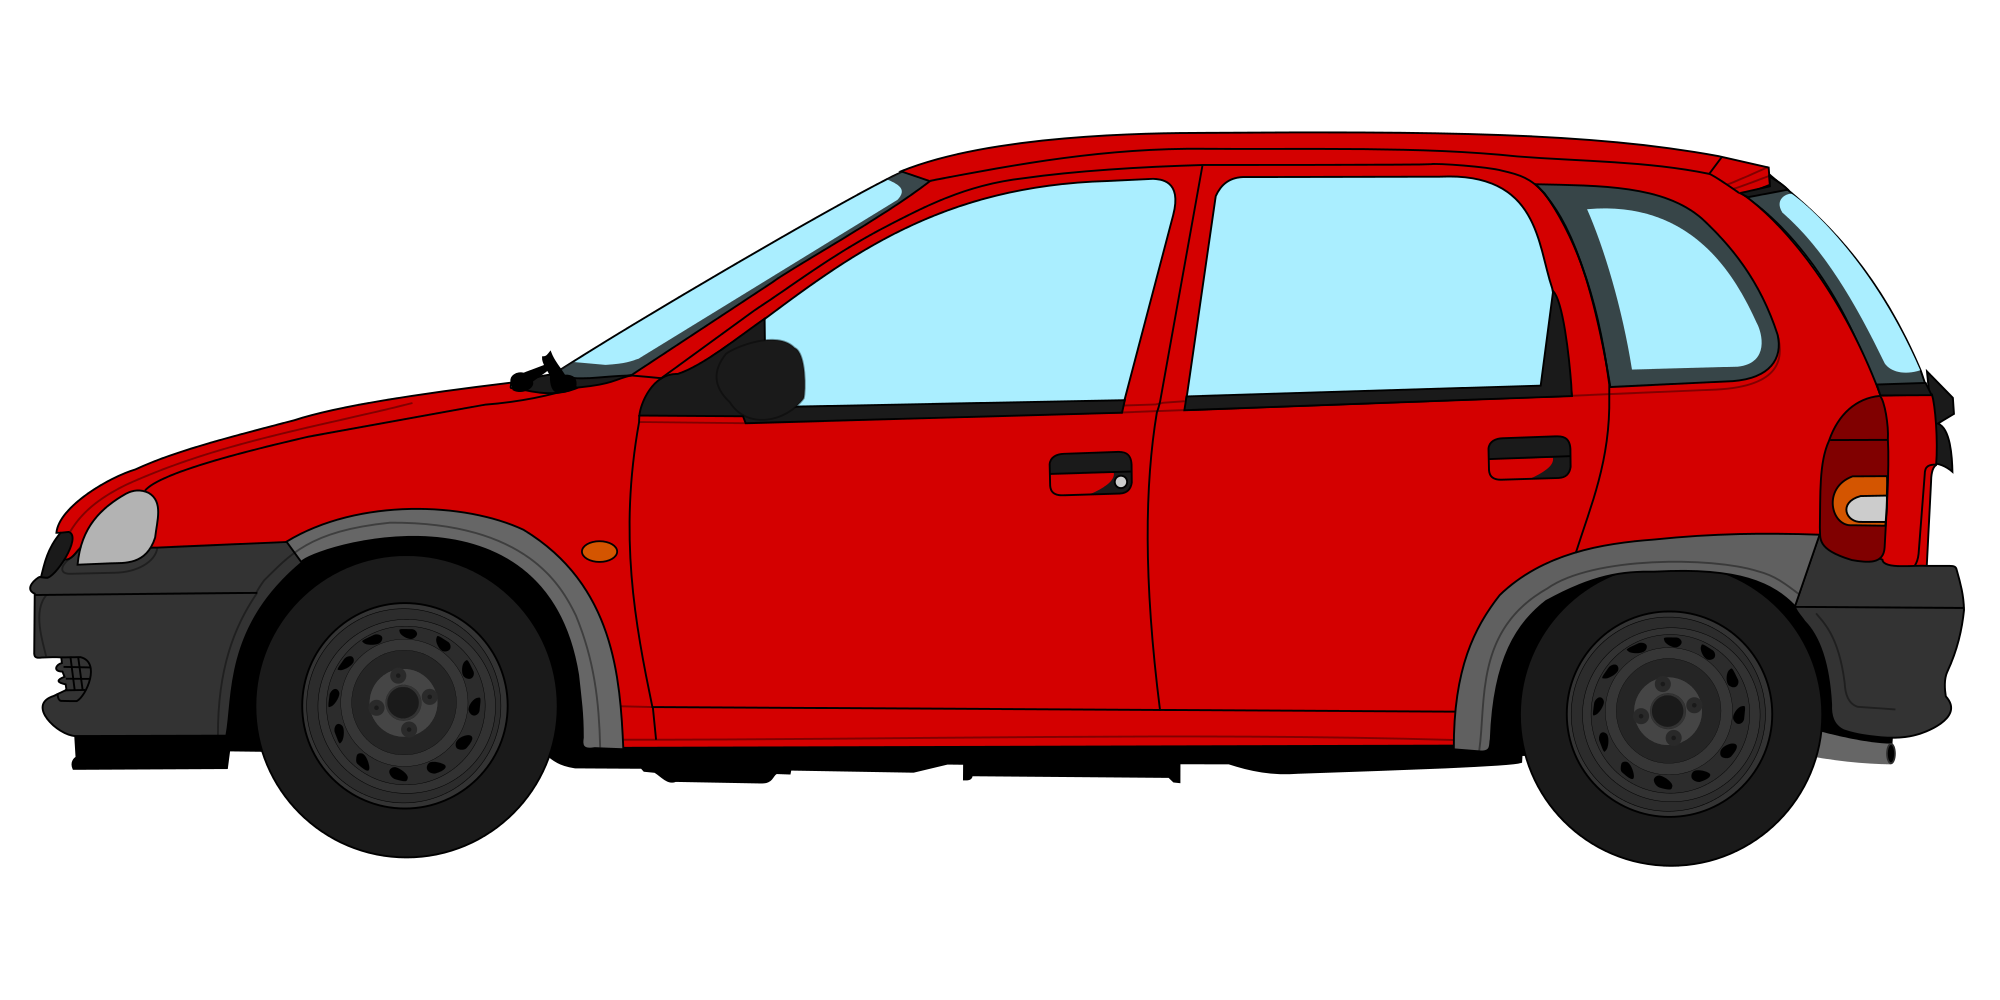 File opel corsa b. Minivan clipart svg